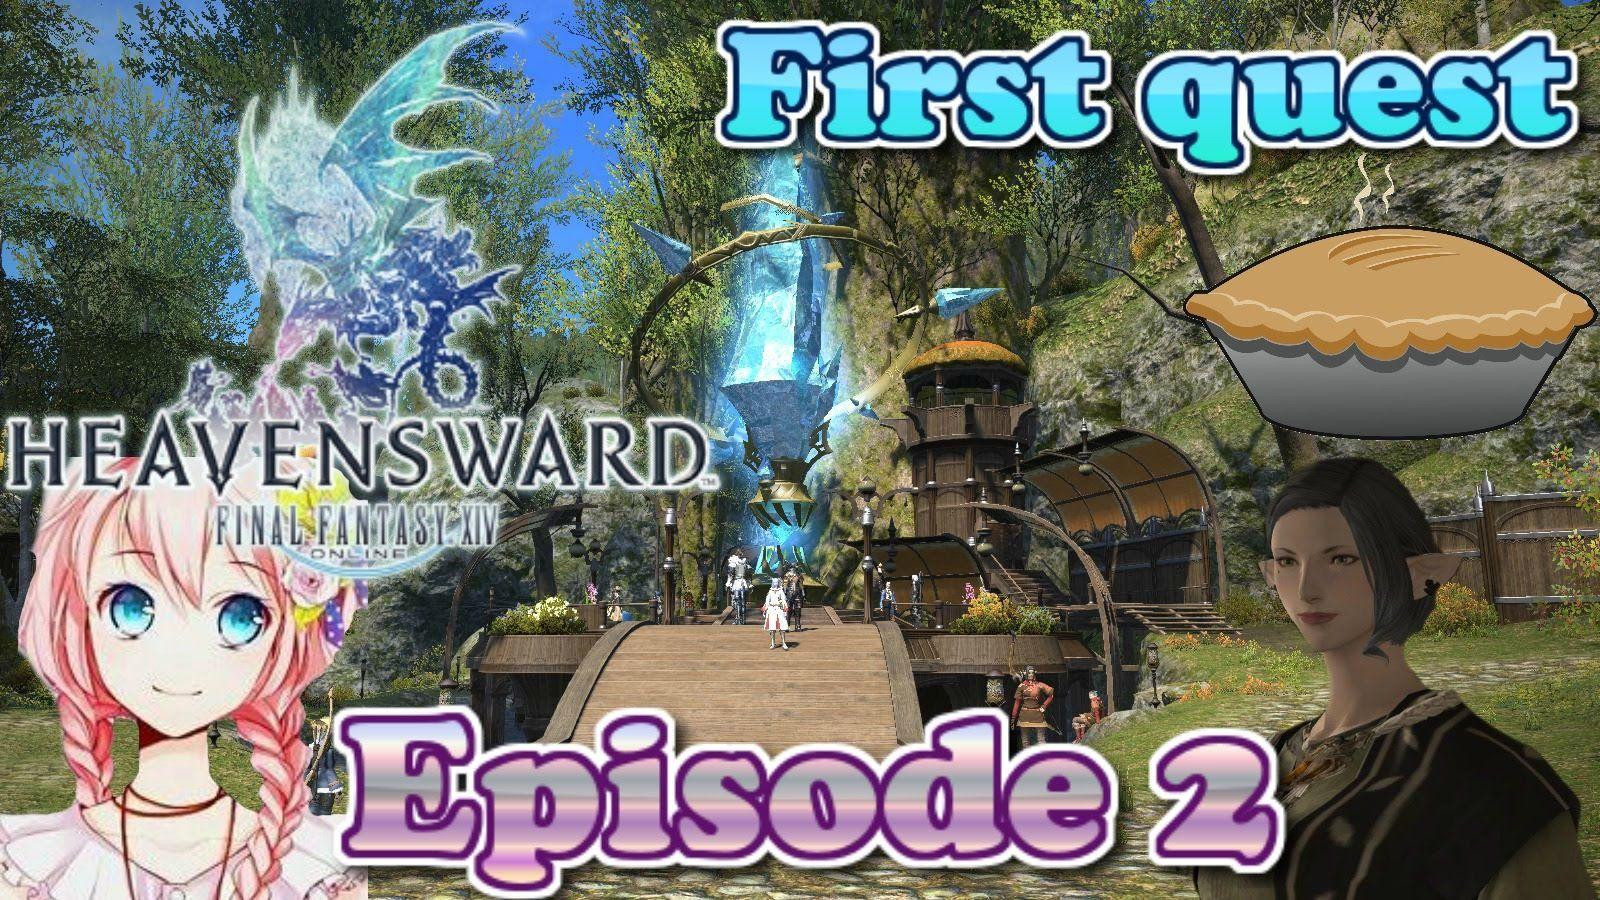 The first quest! Final fantasy 14 Heavensward Episode 2